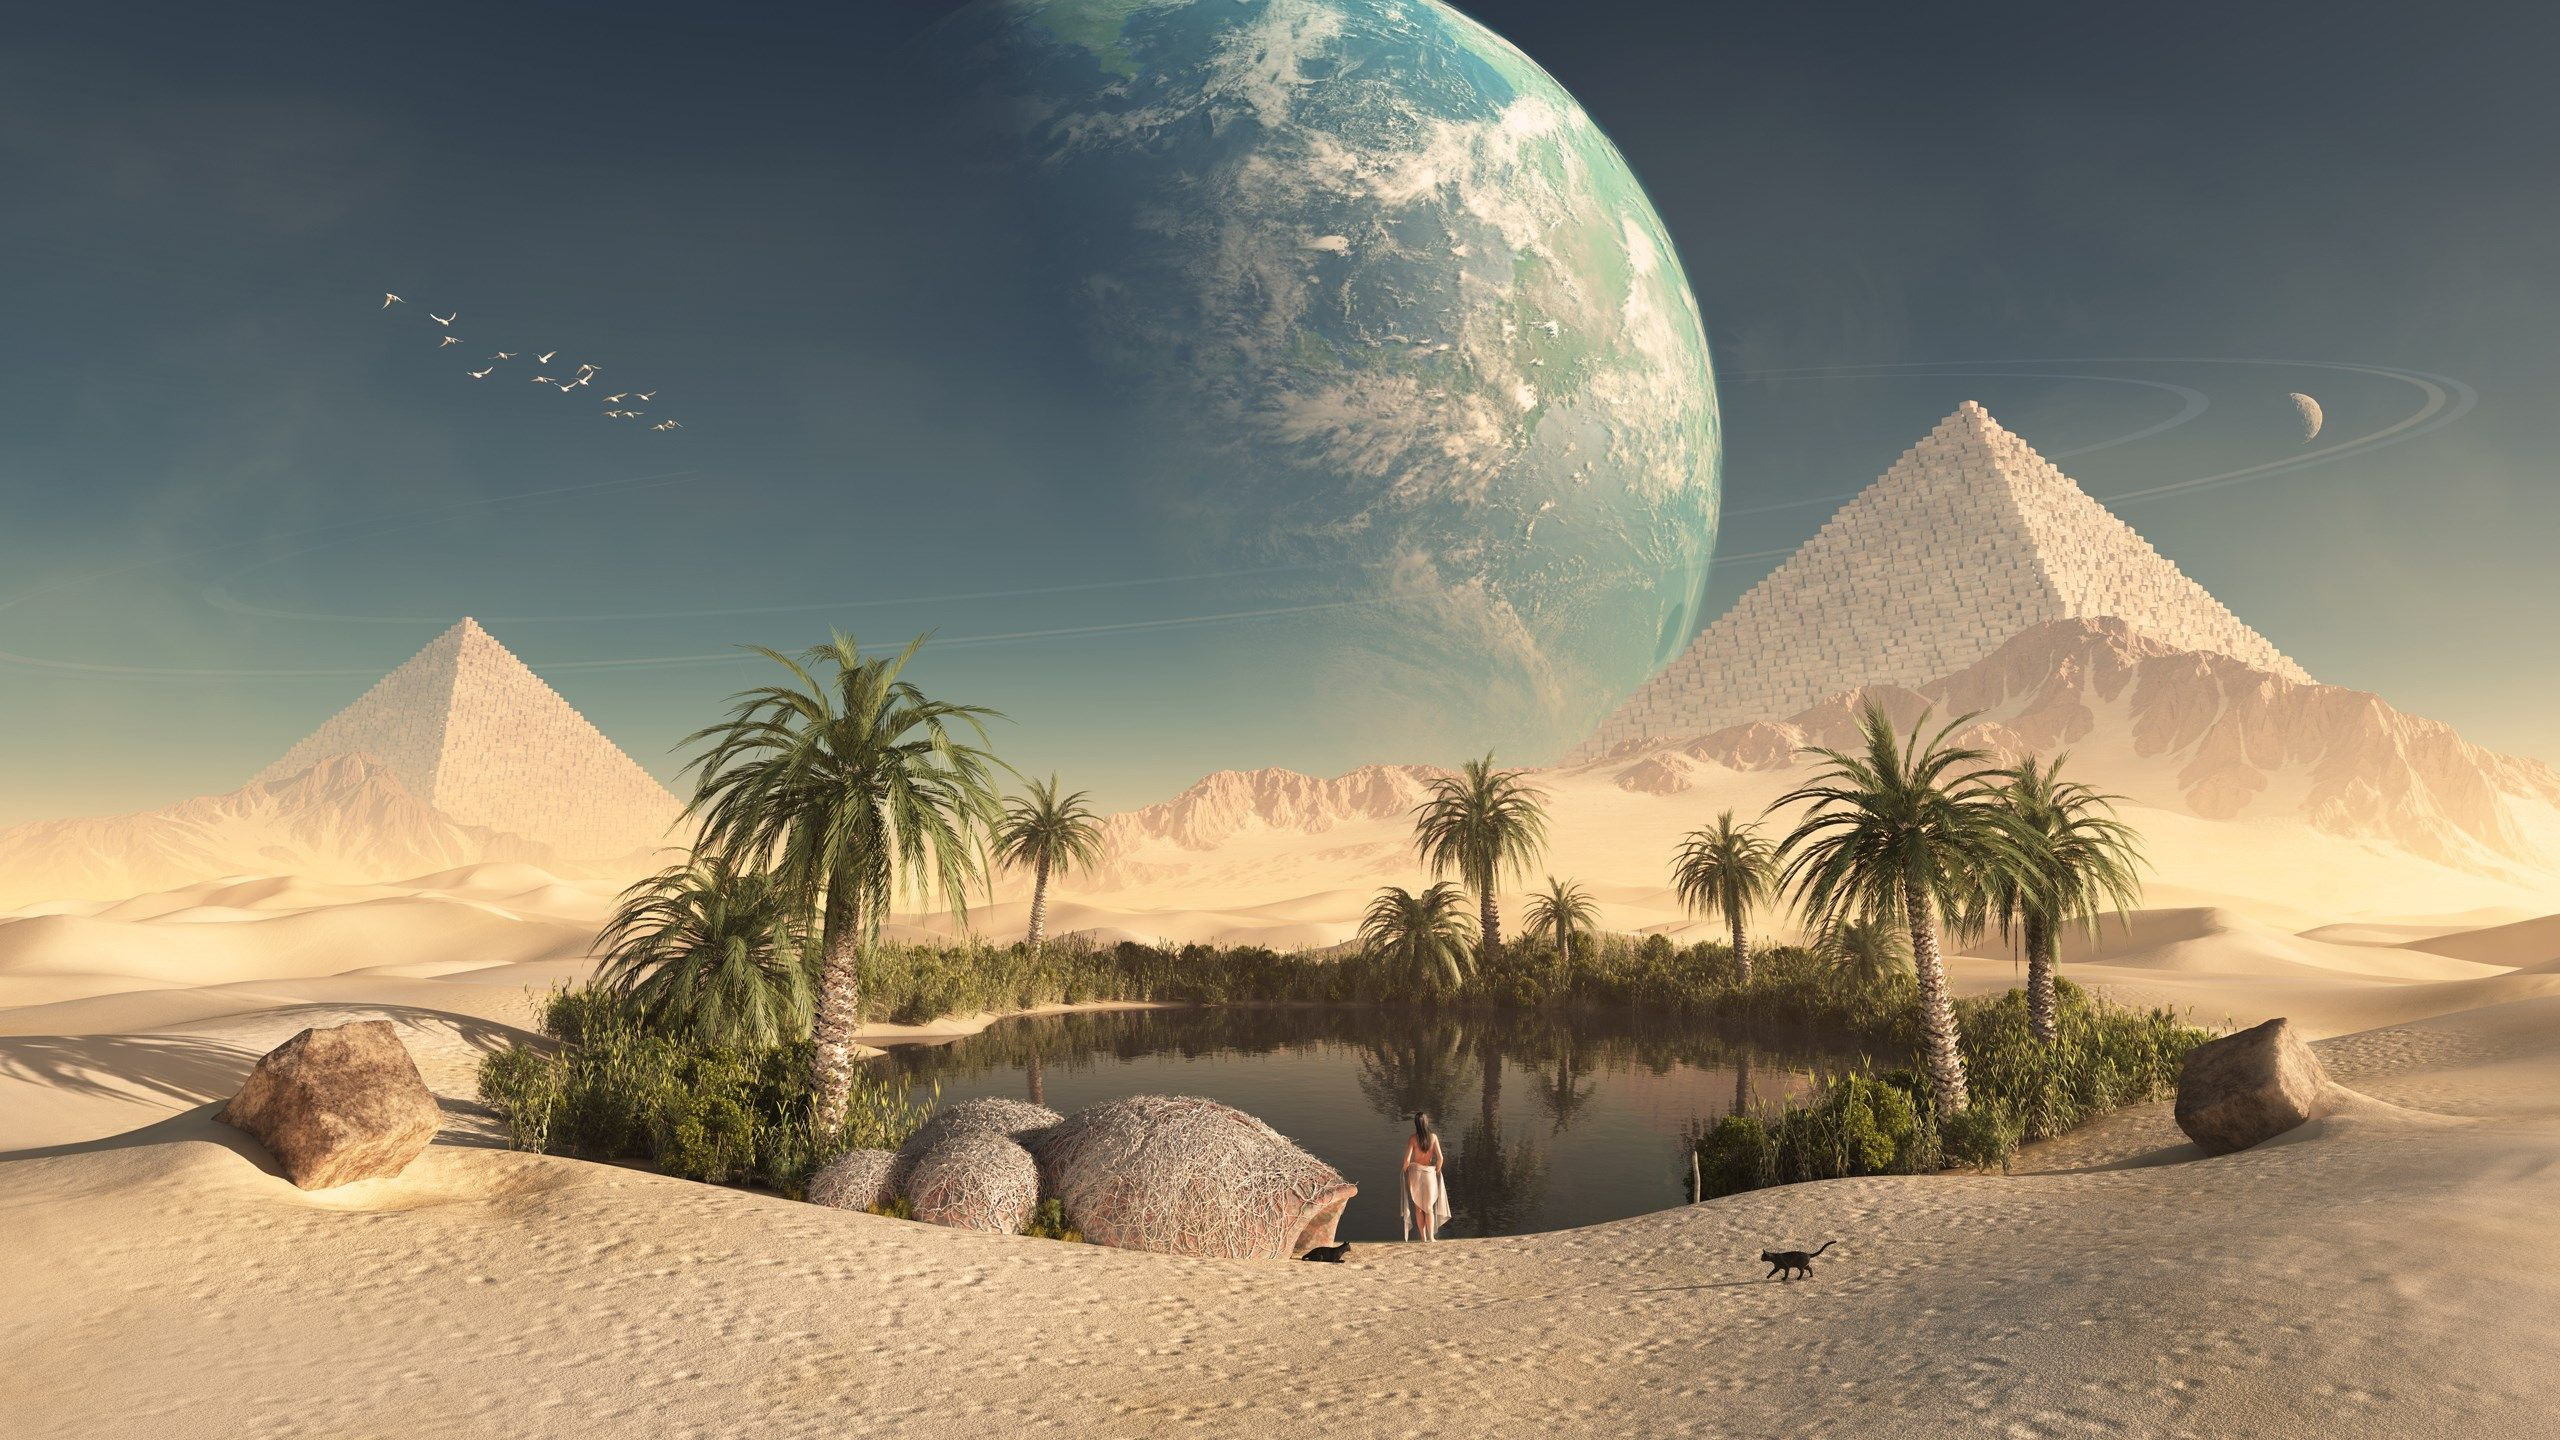 1634736 High Resolution Wallpapers Egyptian Wallpaper